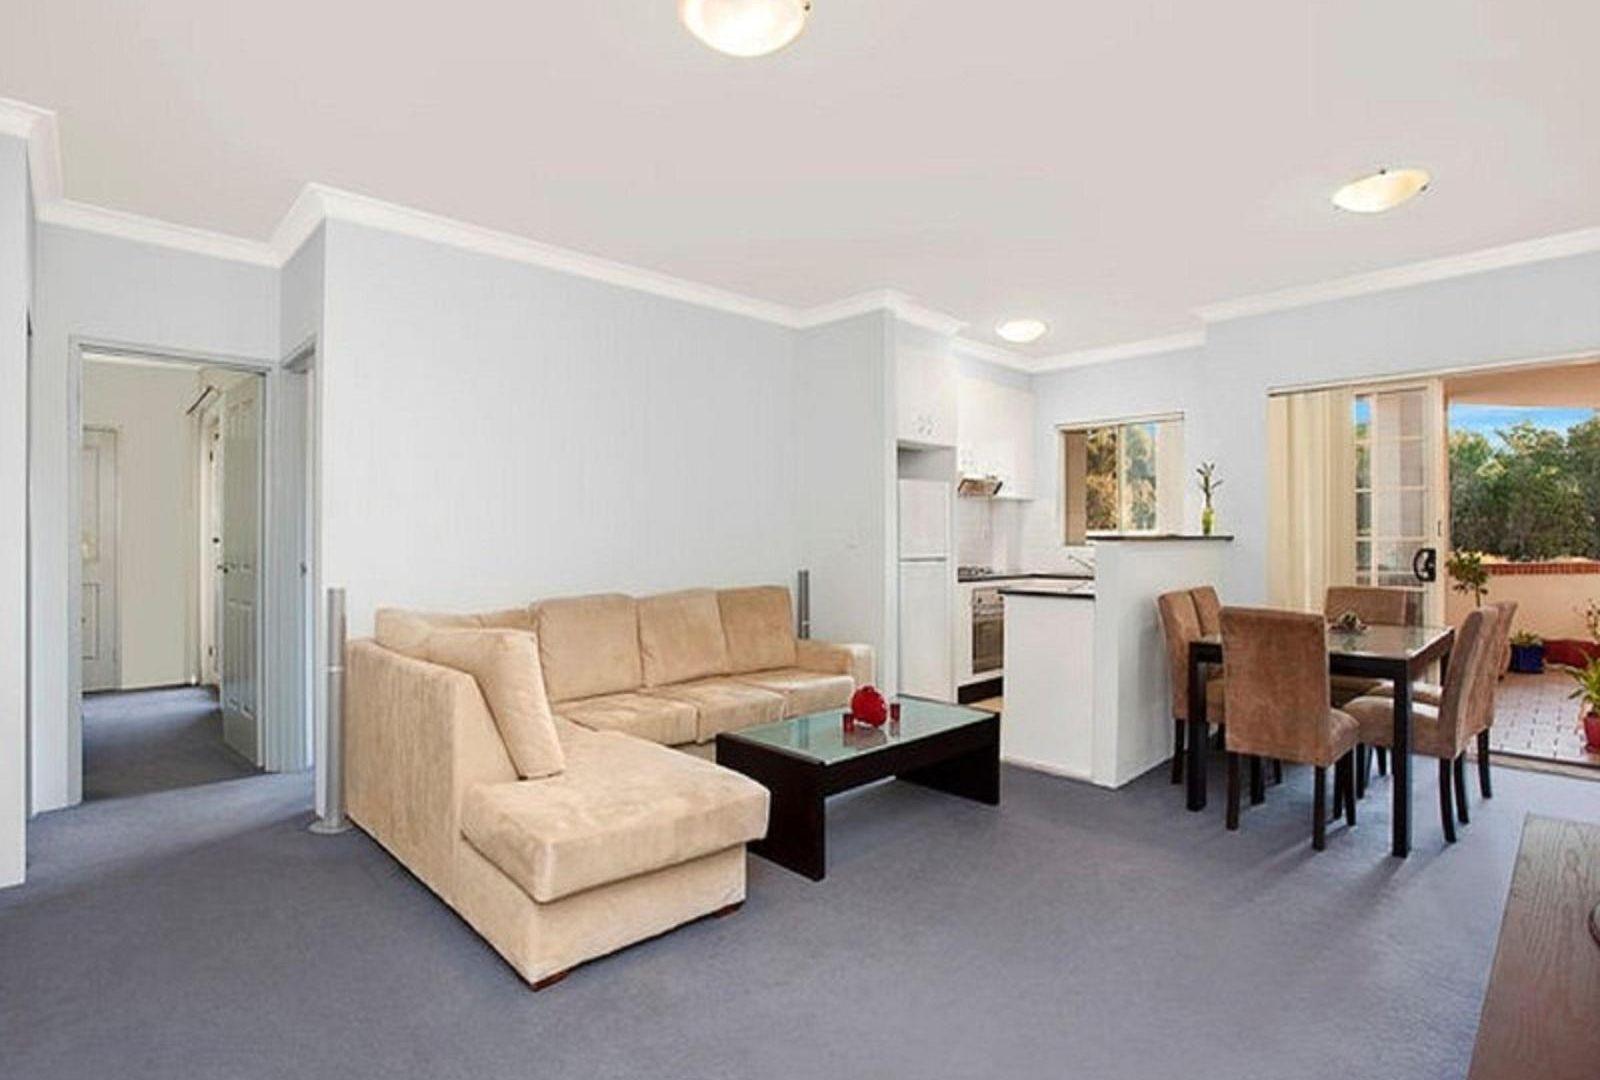 14/1 Macquarie Street, Parramatta NSW 2150, Image 1